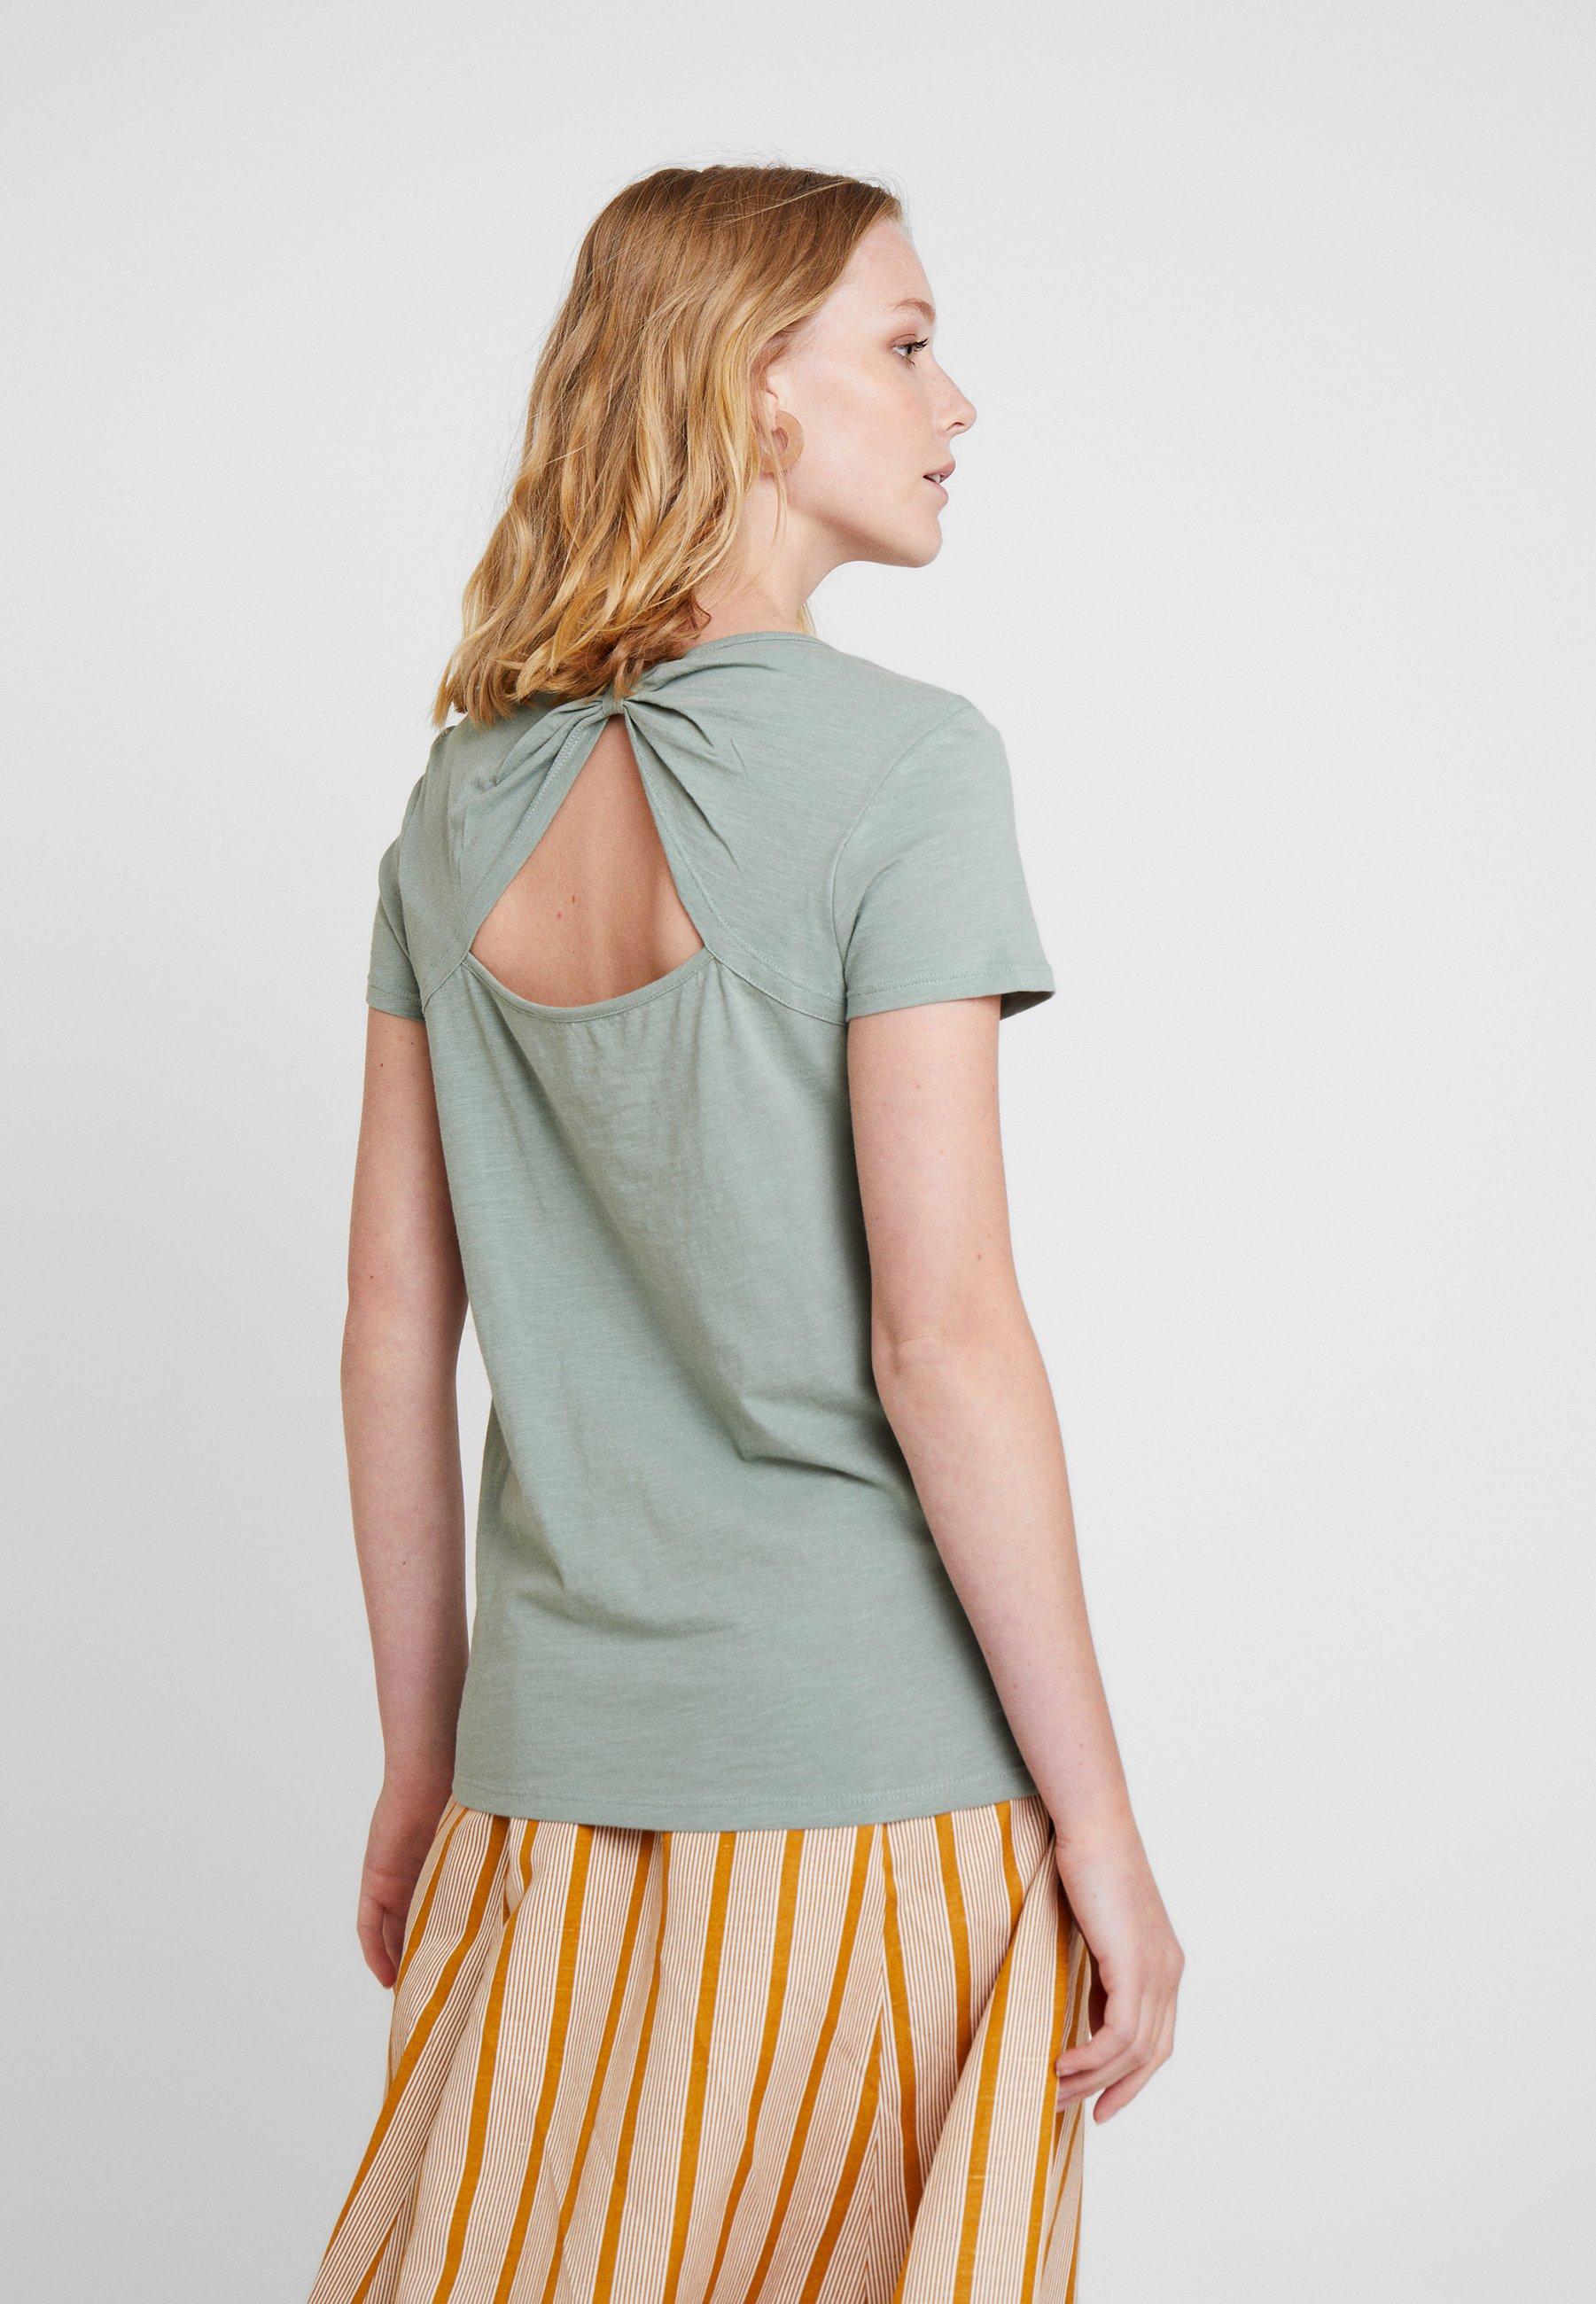 Light Ocs Back Imprimé shirt Edc Esprit Khaki DetailT By wOkZulTPXi